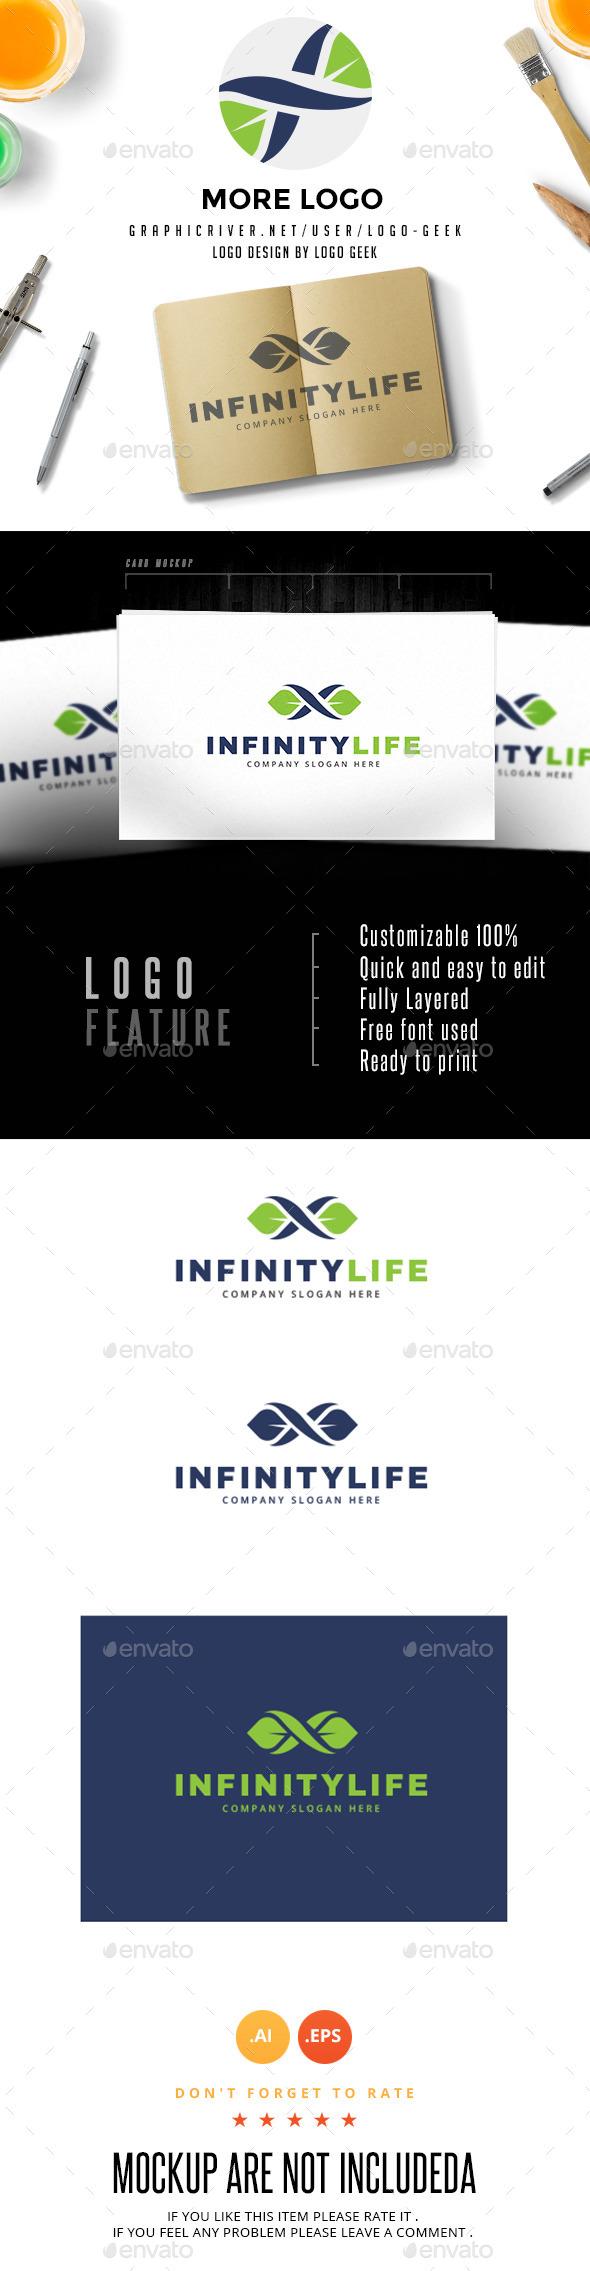 GraphicRiver Infinity Life 10602062